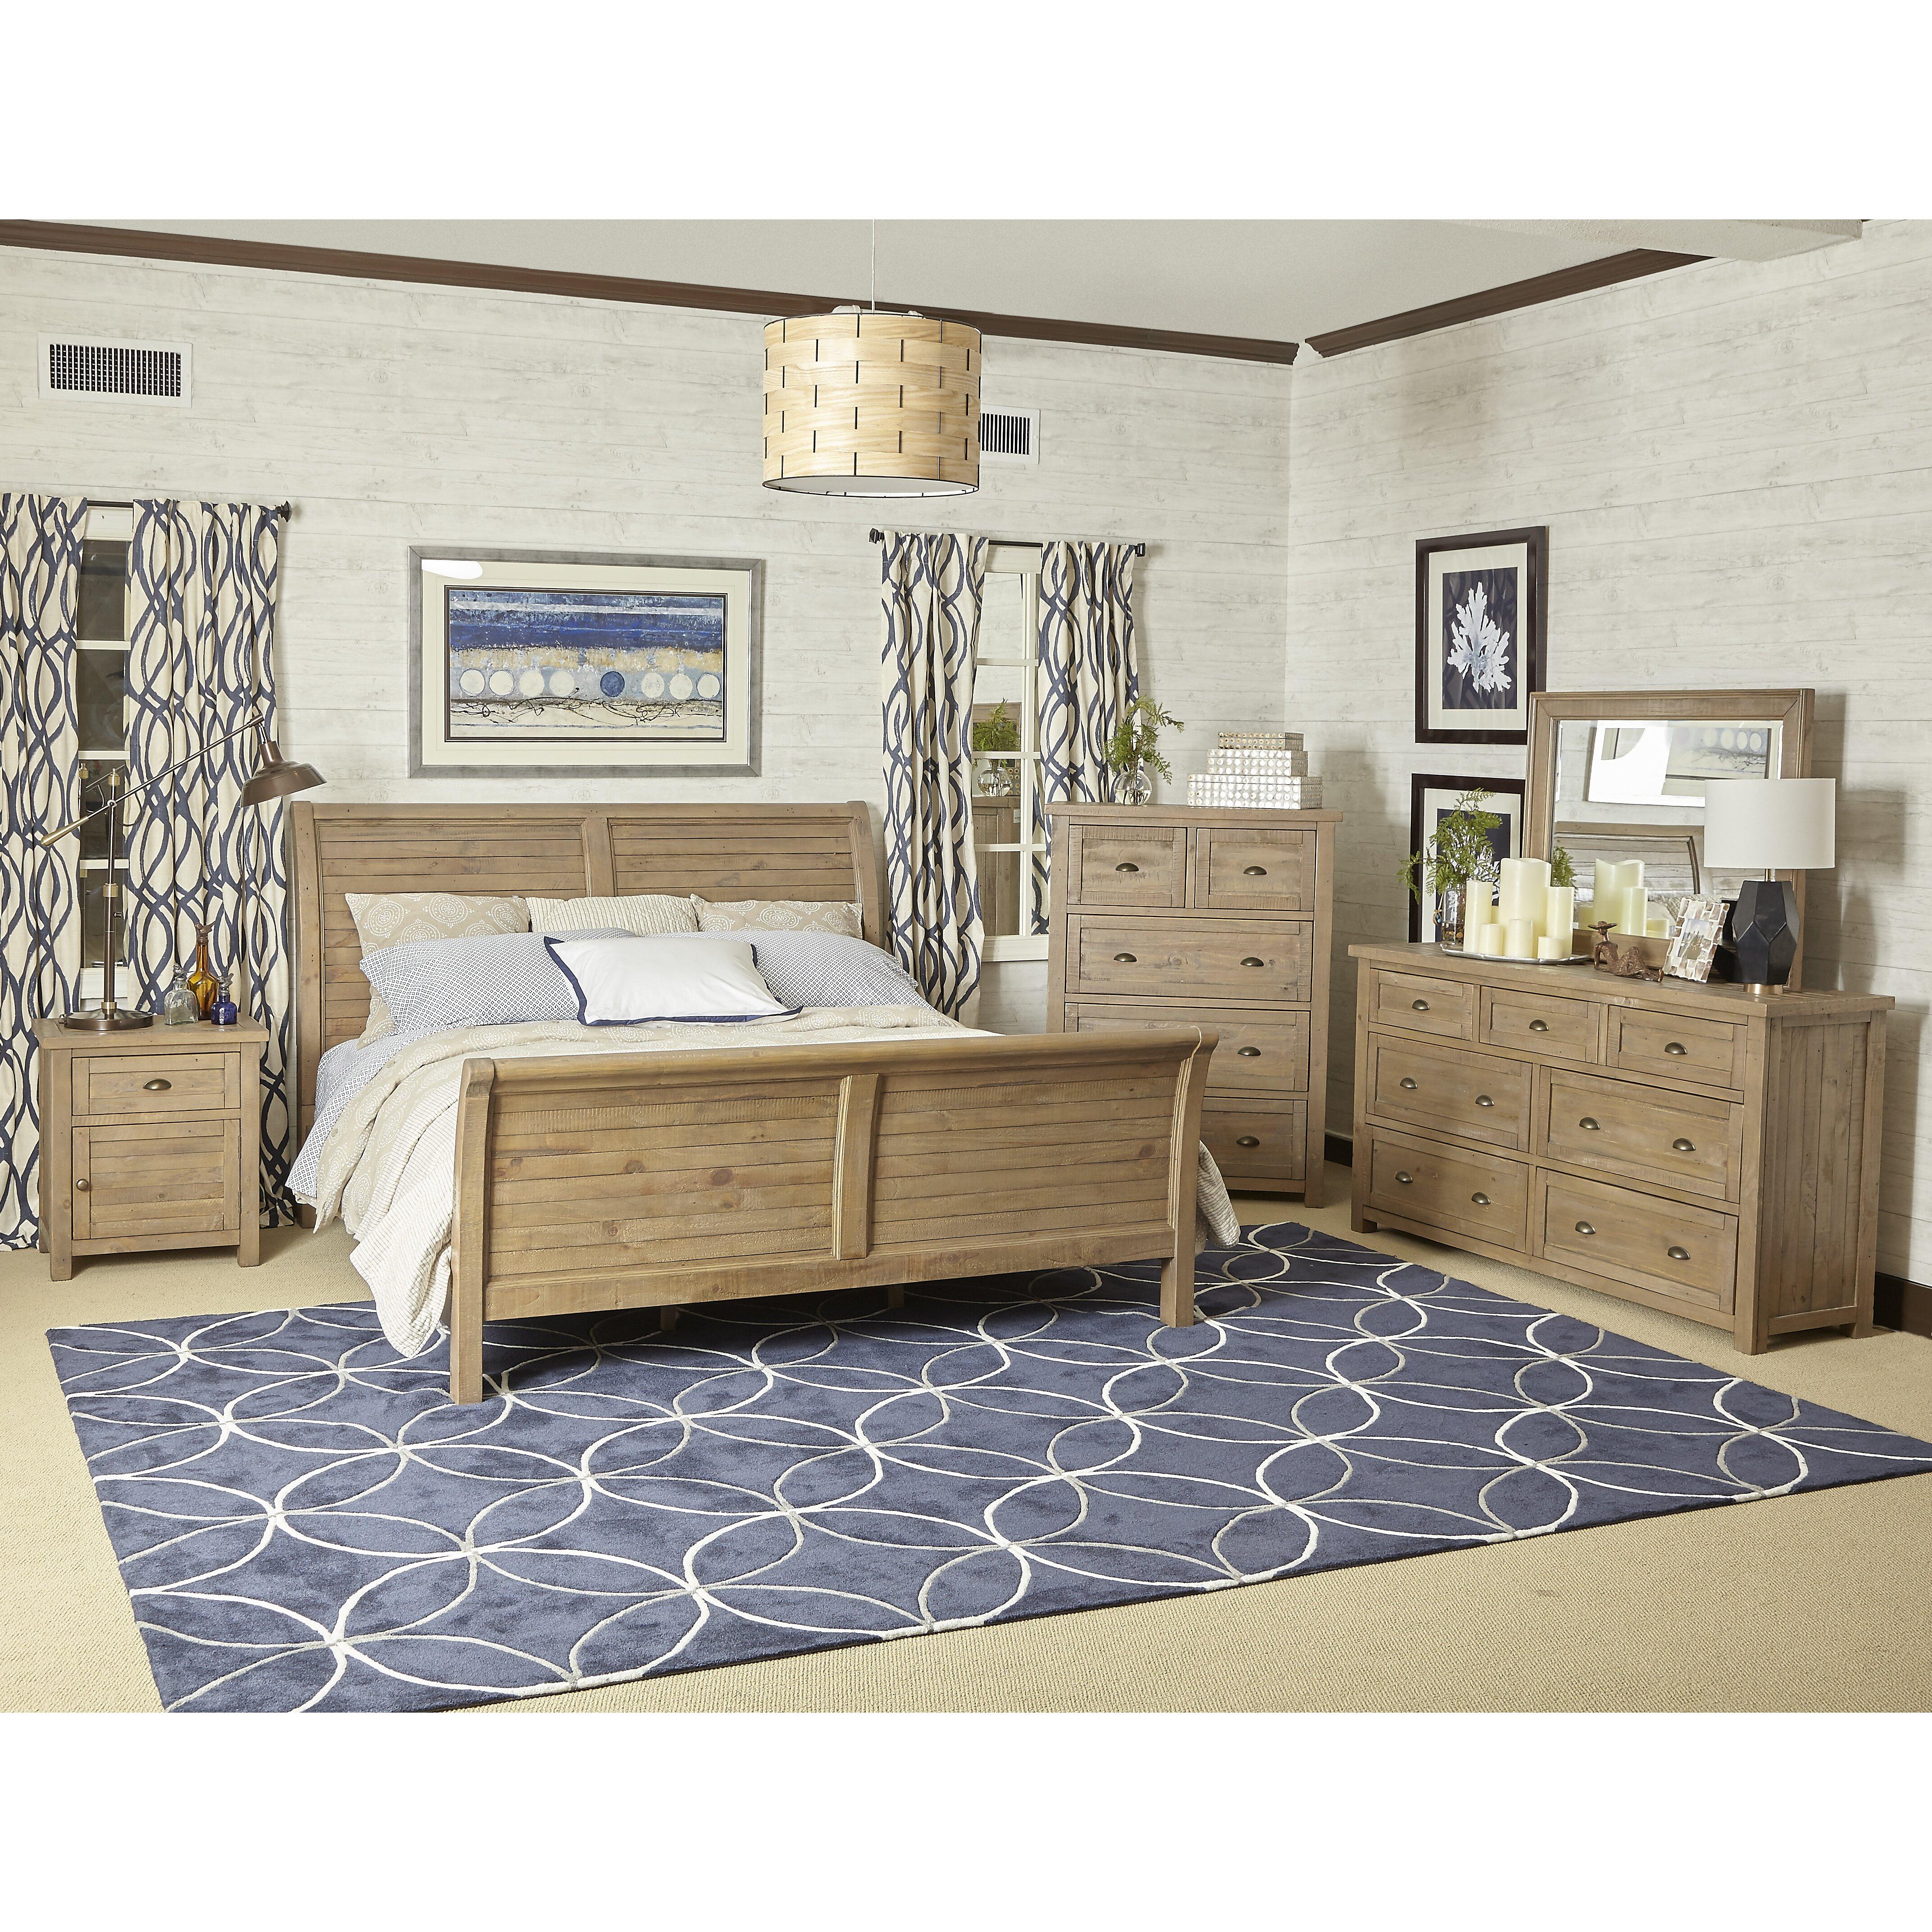 Laurel Foundry Modern Farmhouse Cannes Sleigh Customizable Bedroom Set Reviews Wayfair